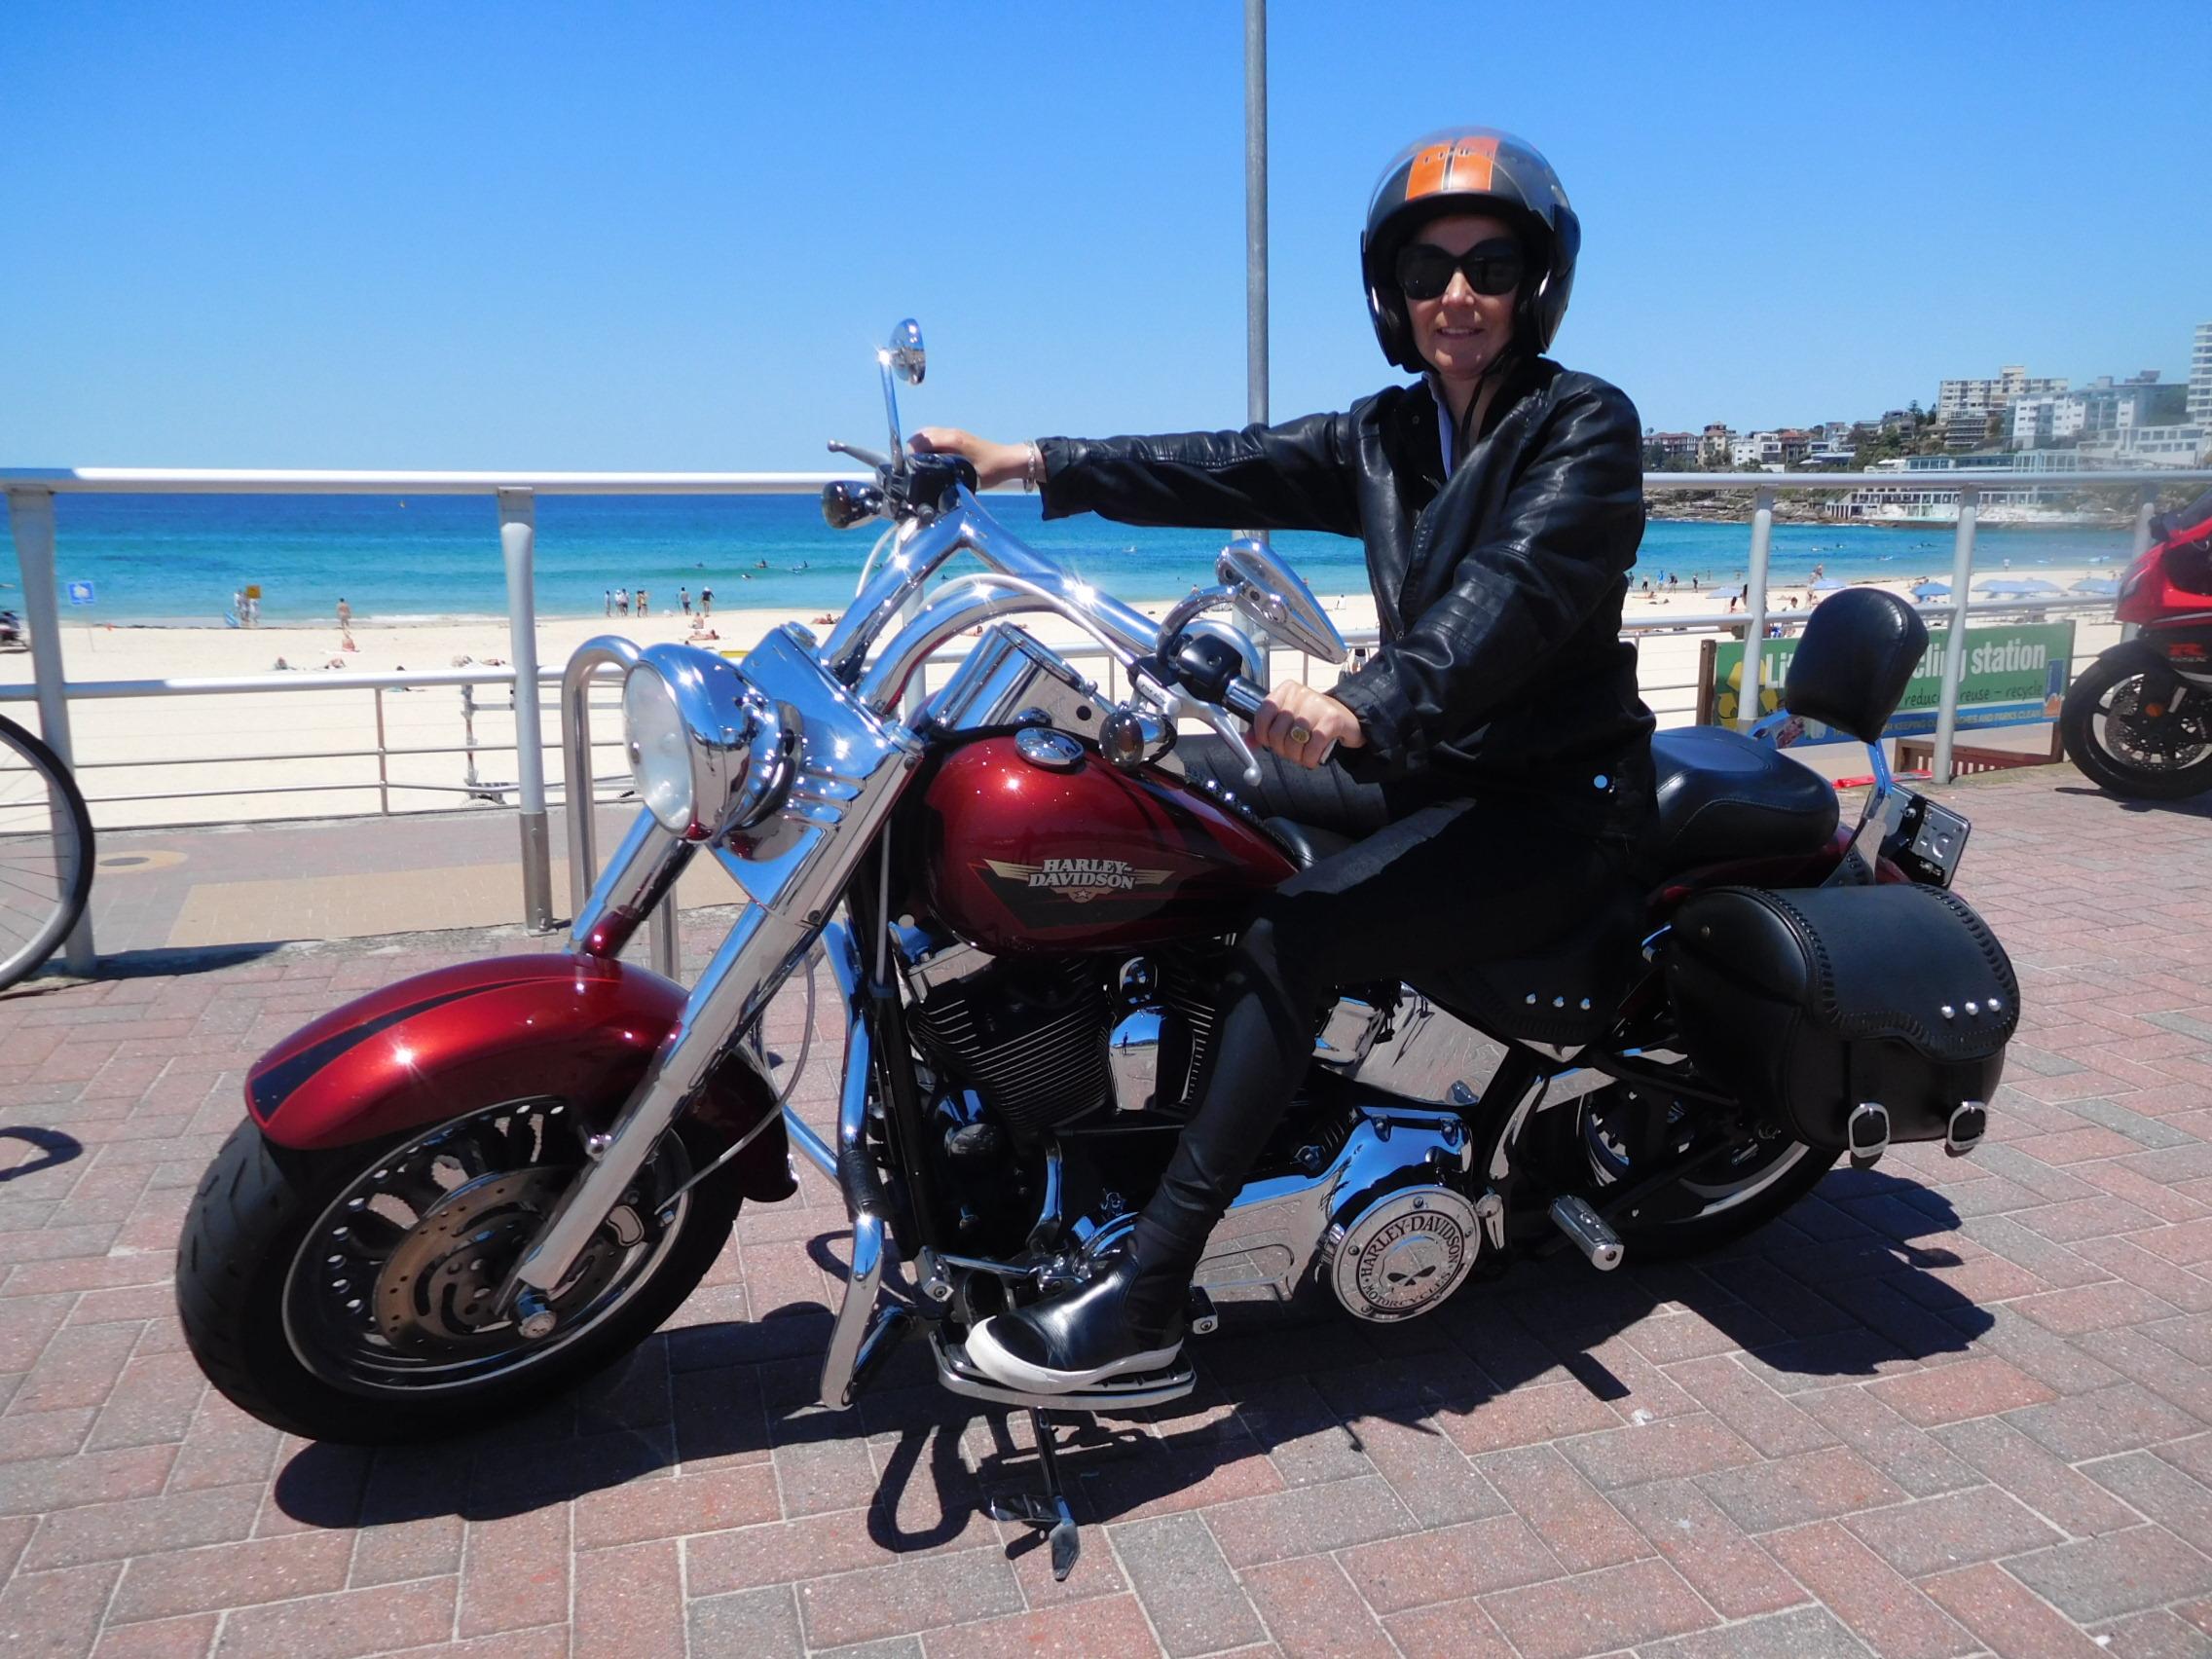 Harley tour bucket list tick